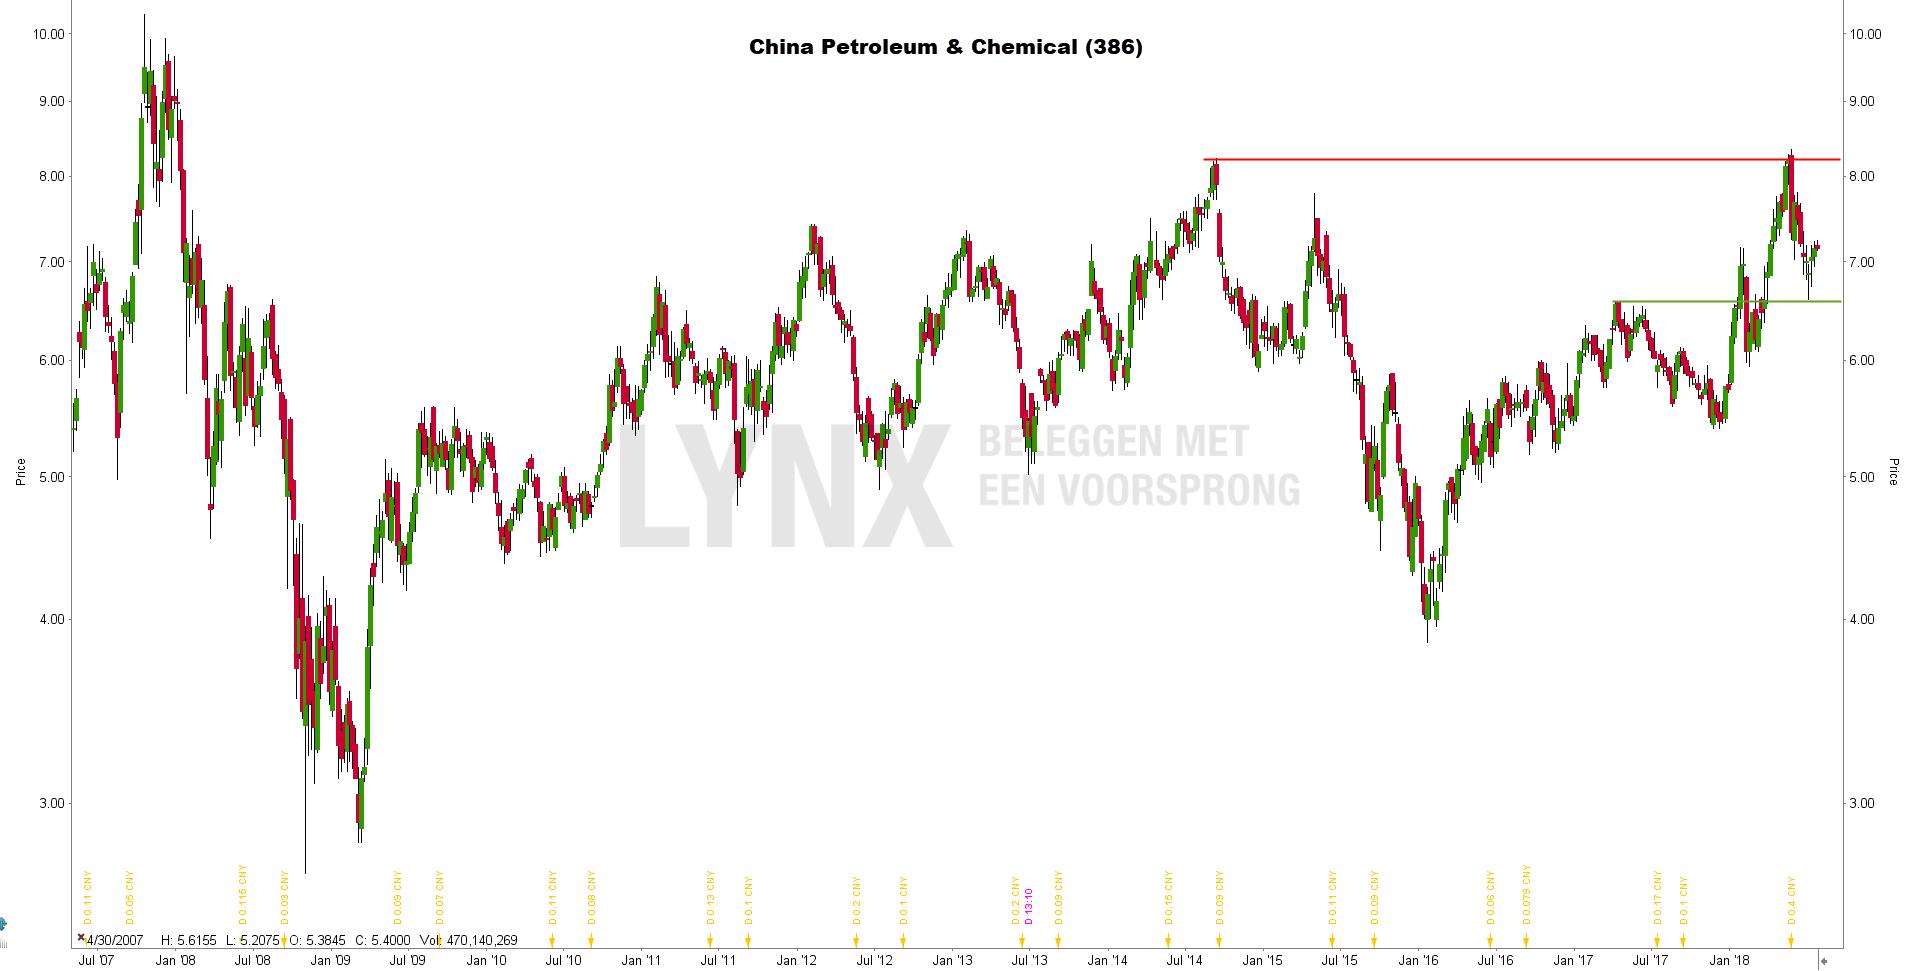 Beste Chinese aandelen: China Petroleum & Chemical